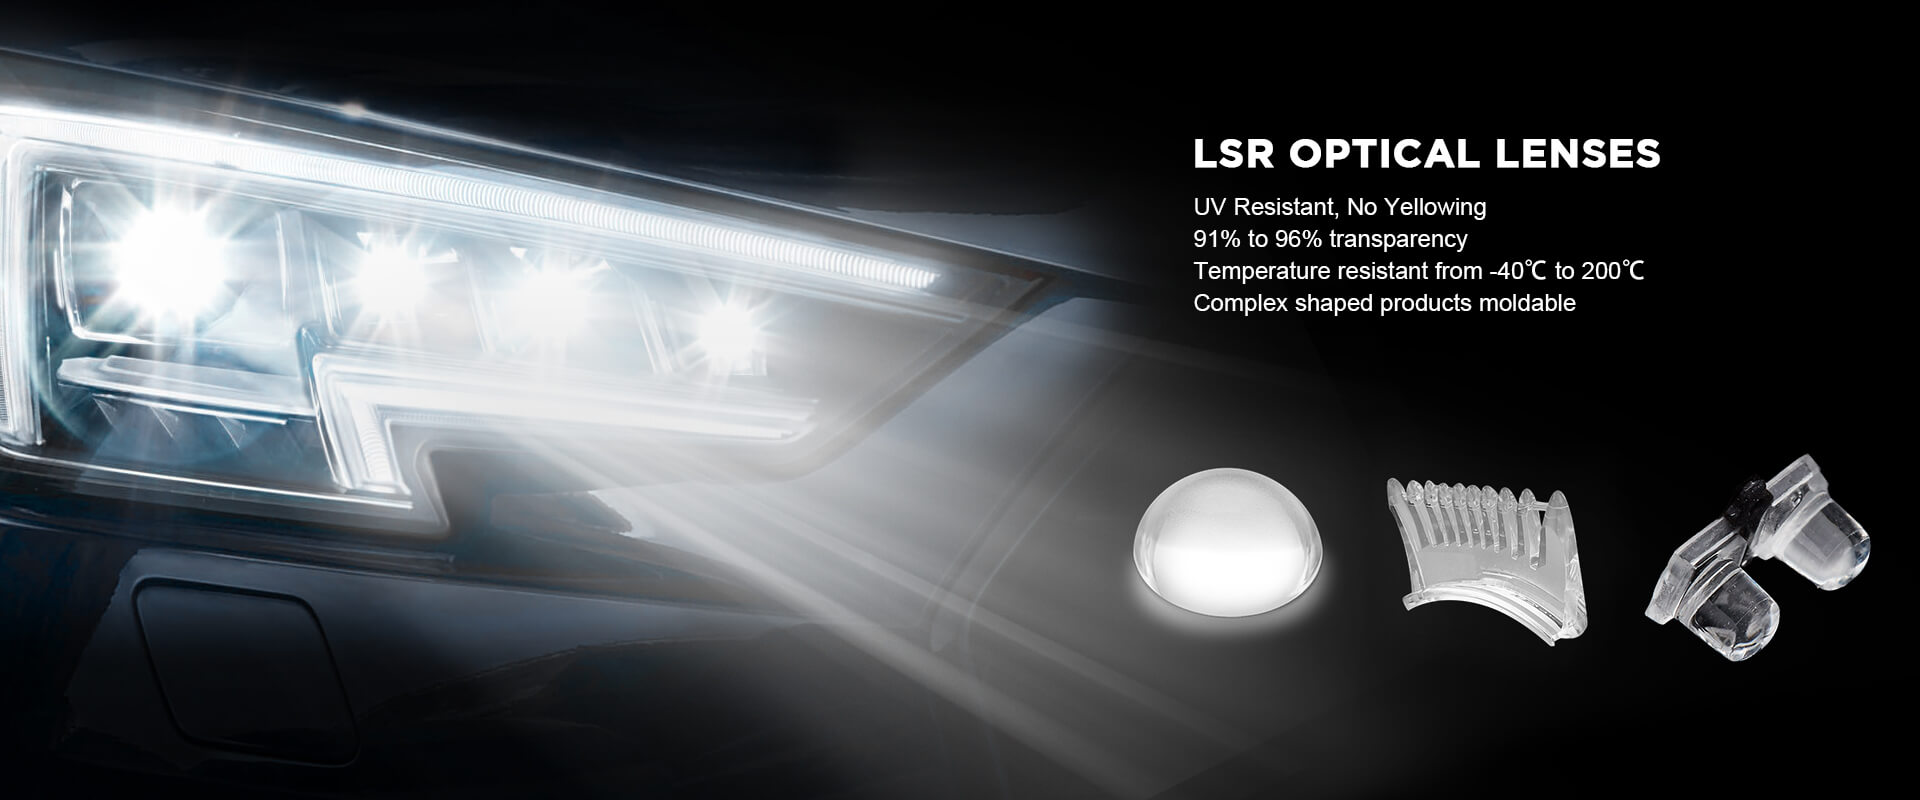 Optical Silicone Lens